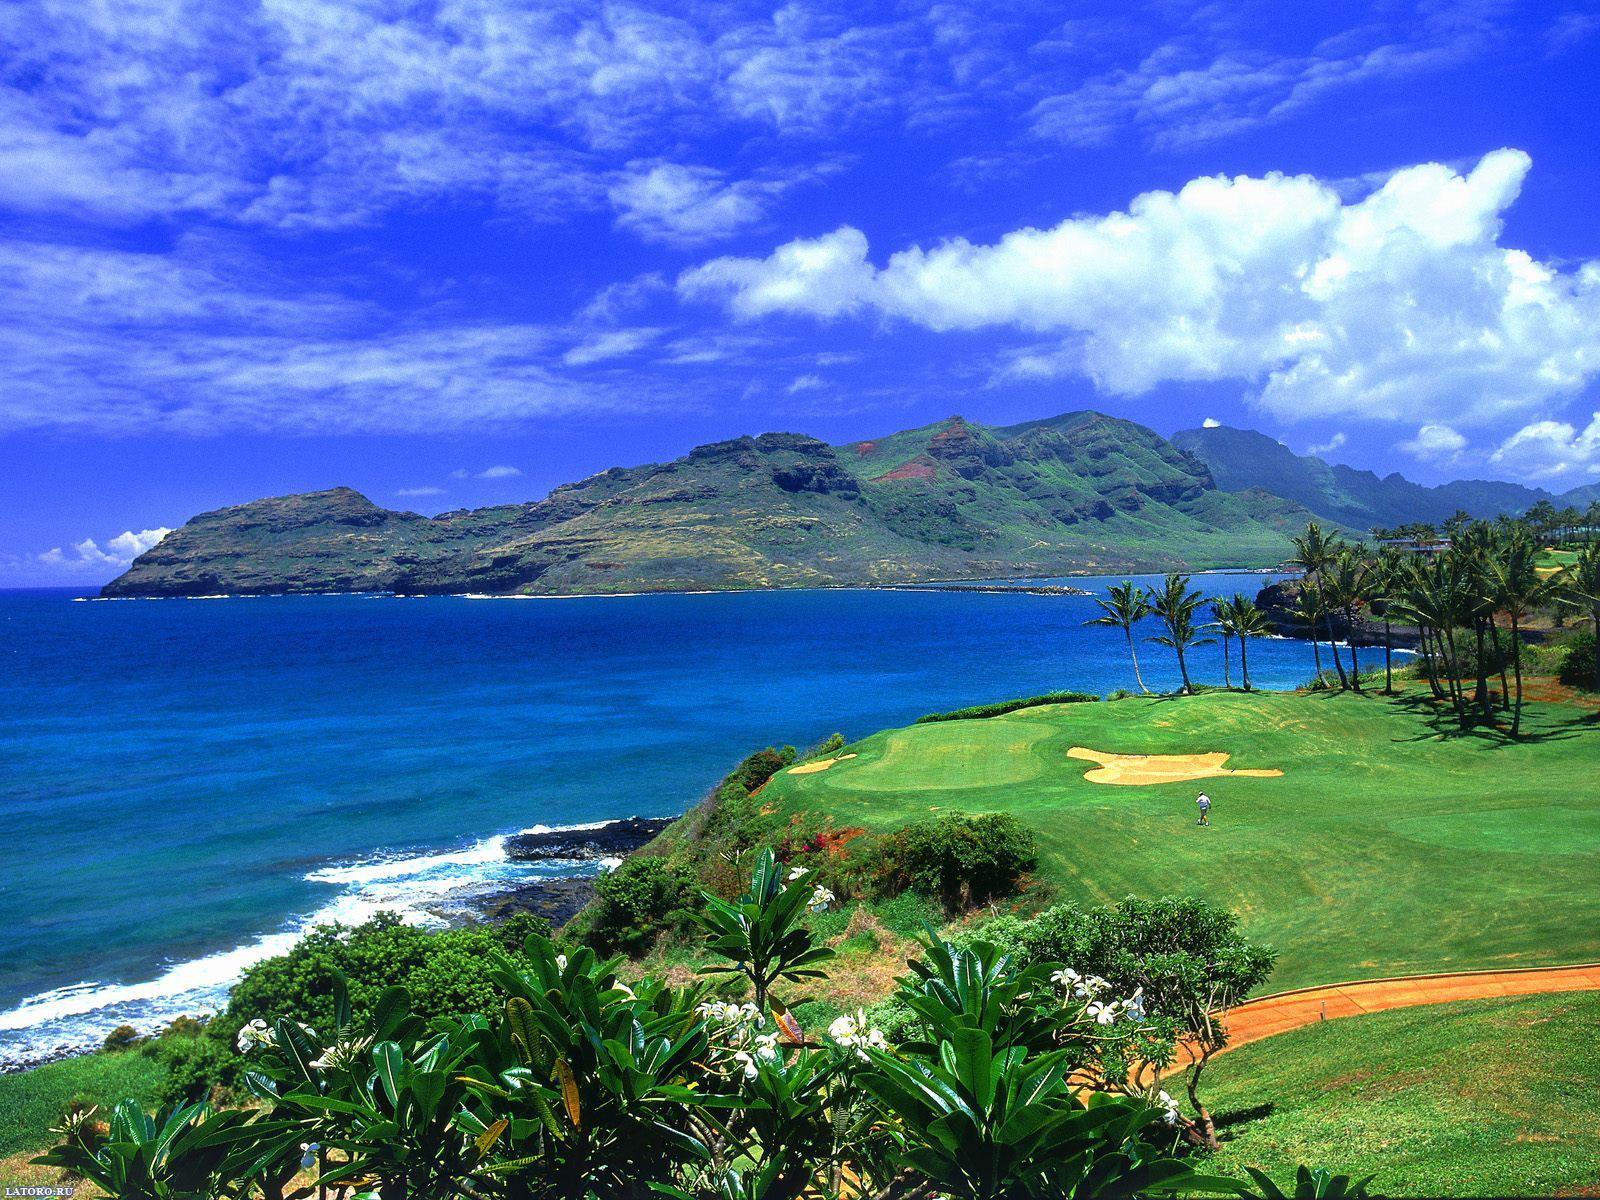 Hawaiian islands Desktop Wallpapers FREE on Latorocom 1600x1200